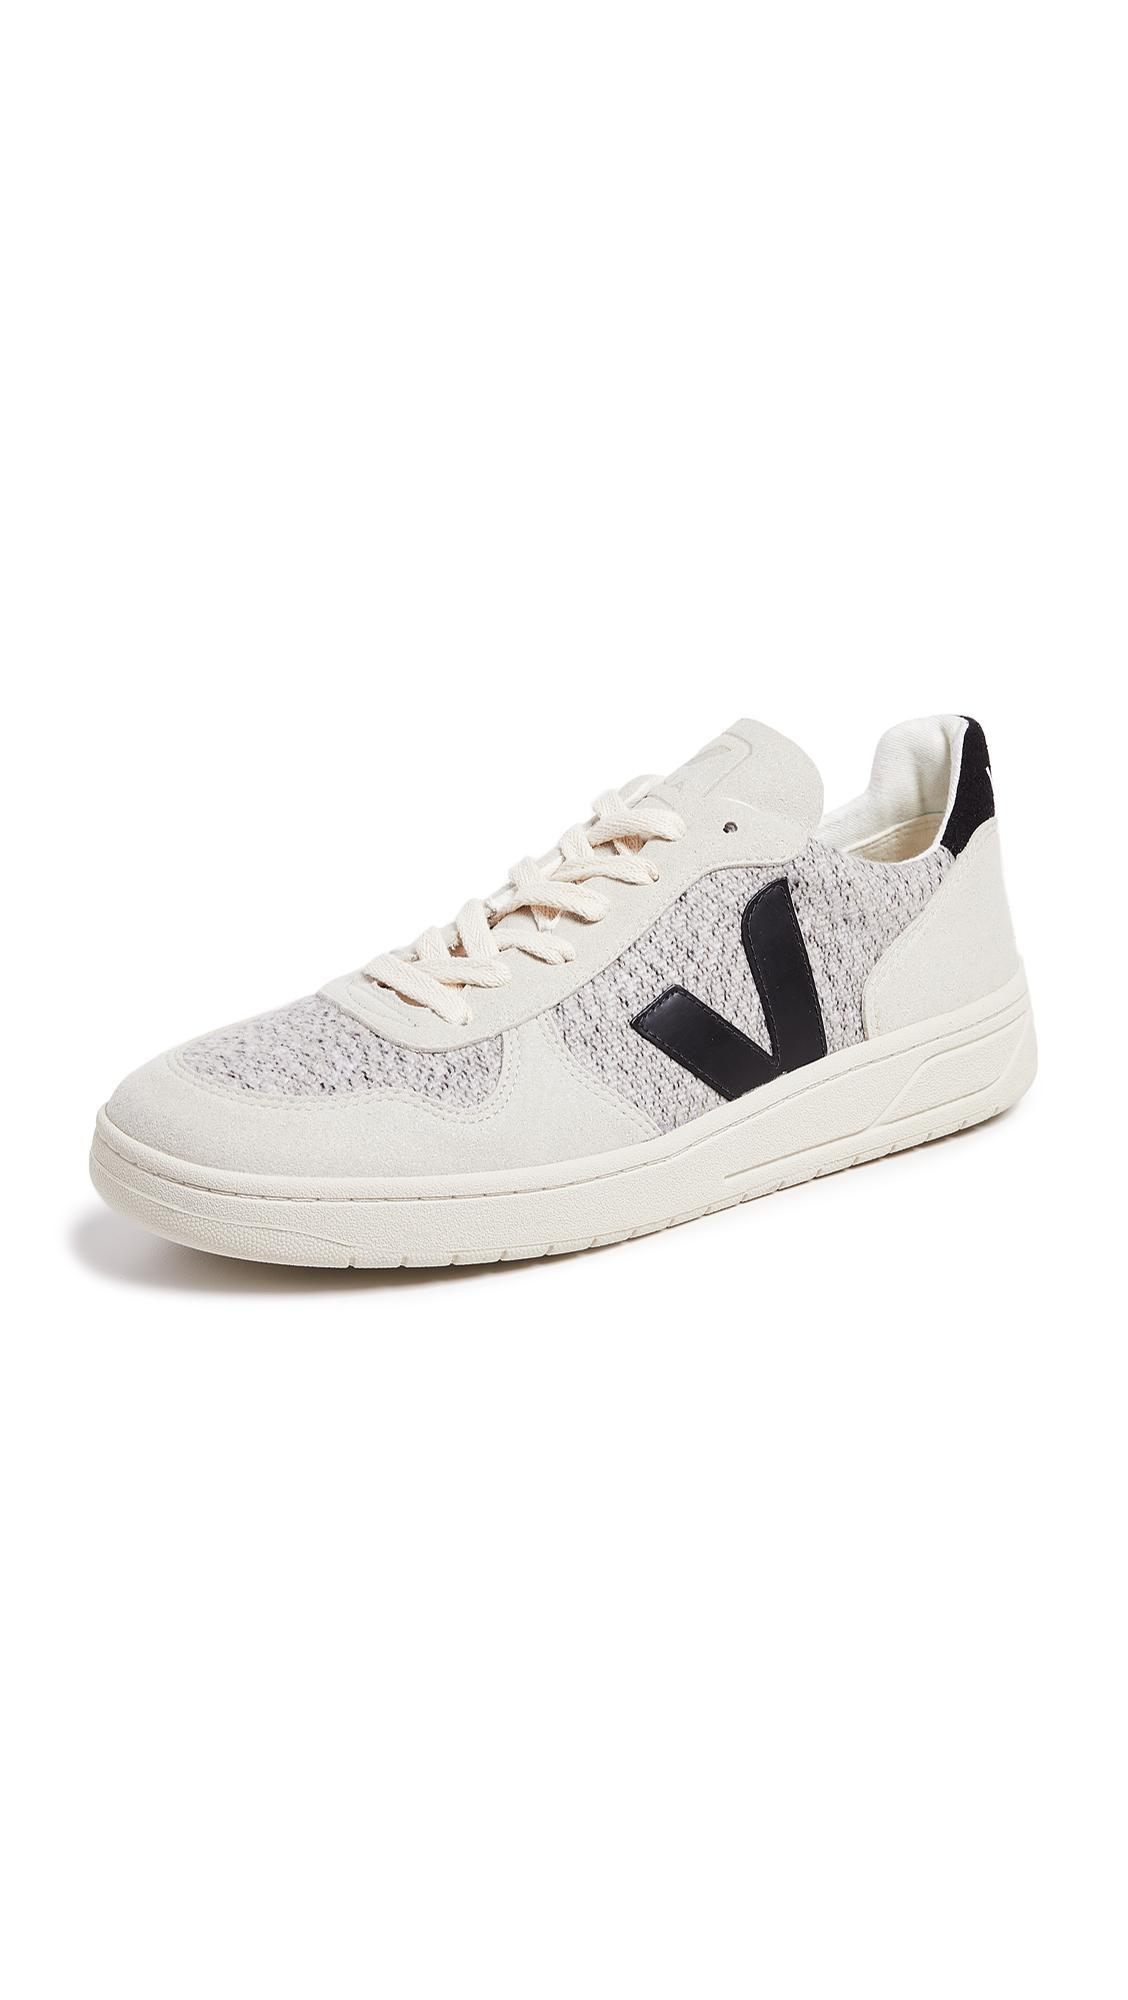 2c0c39c3a4c0e6 Veja V-10 Flannel Sneakers In White Multi